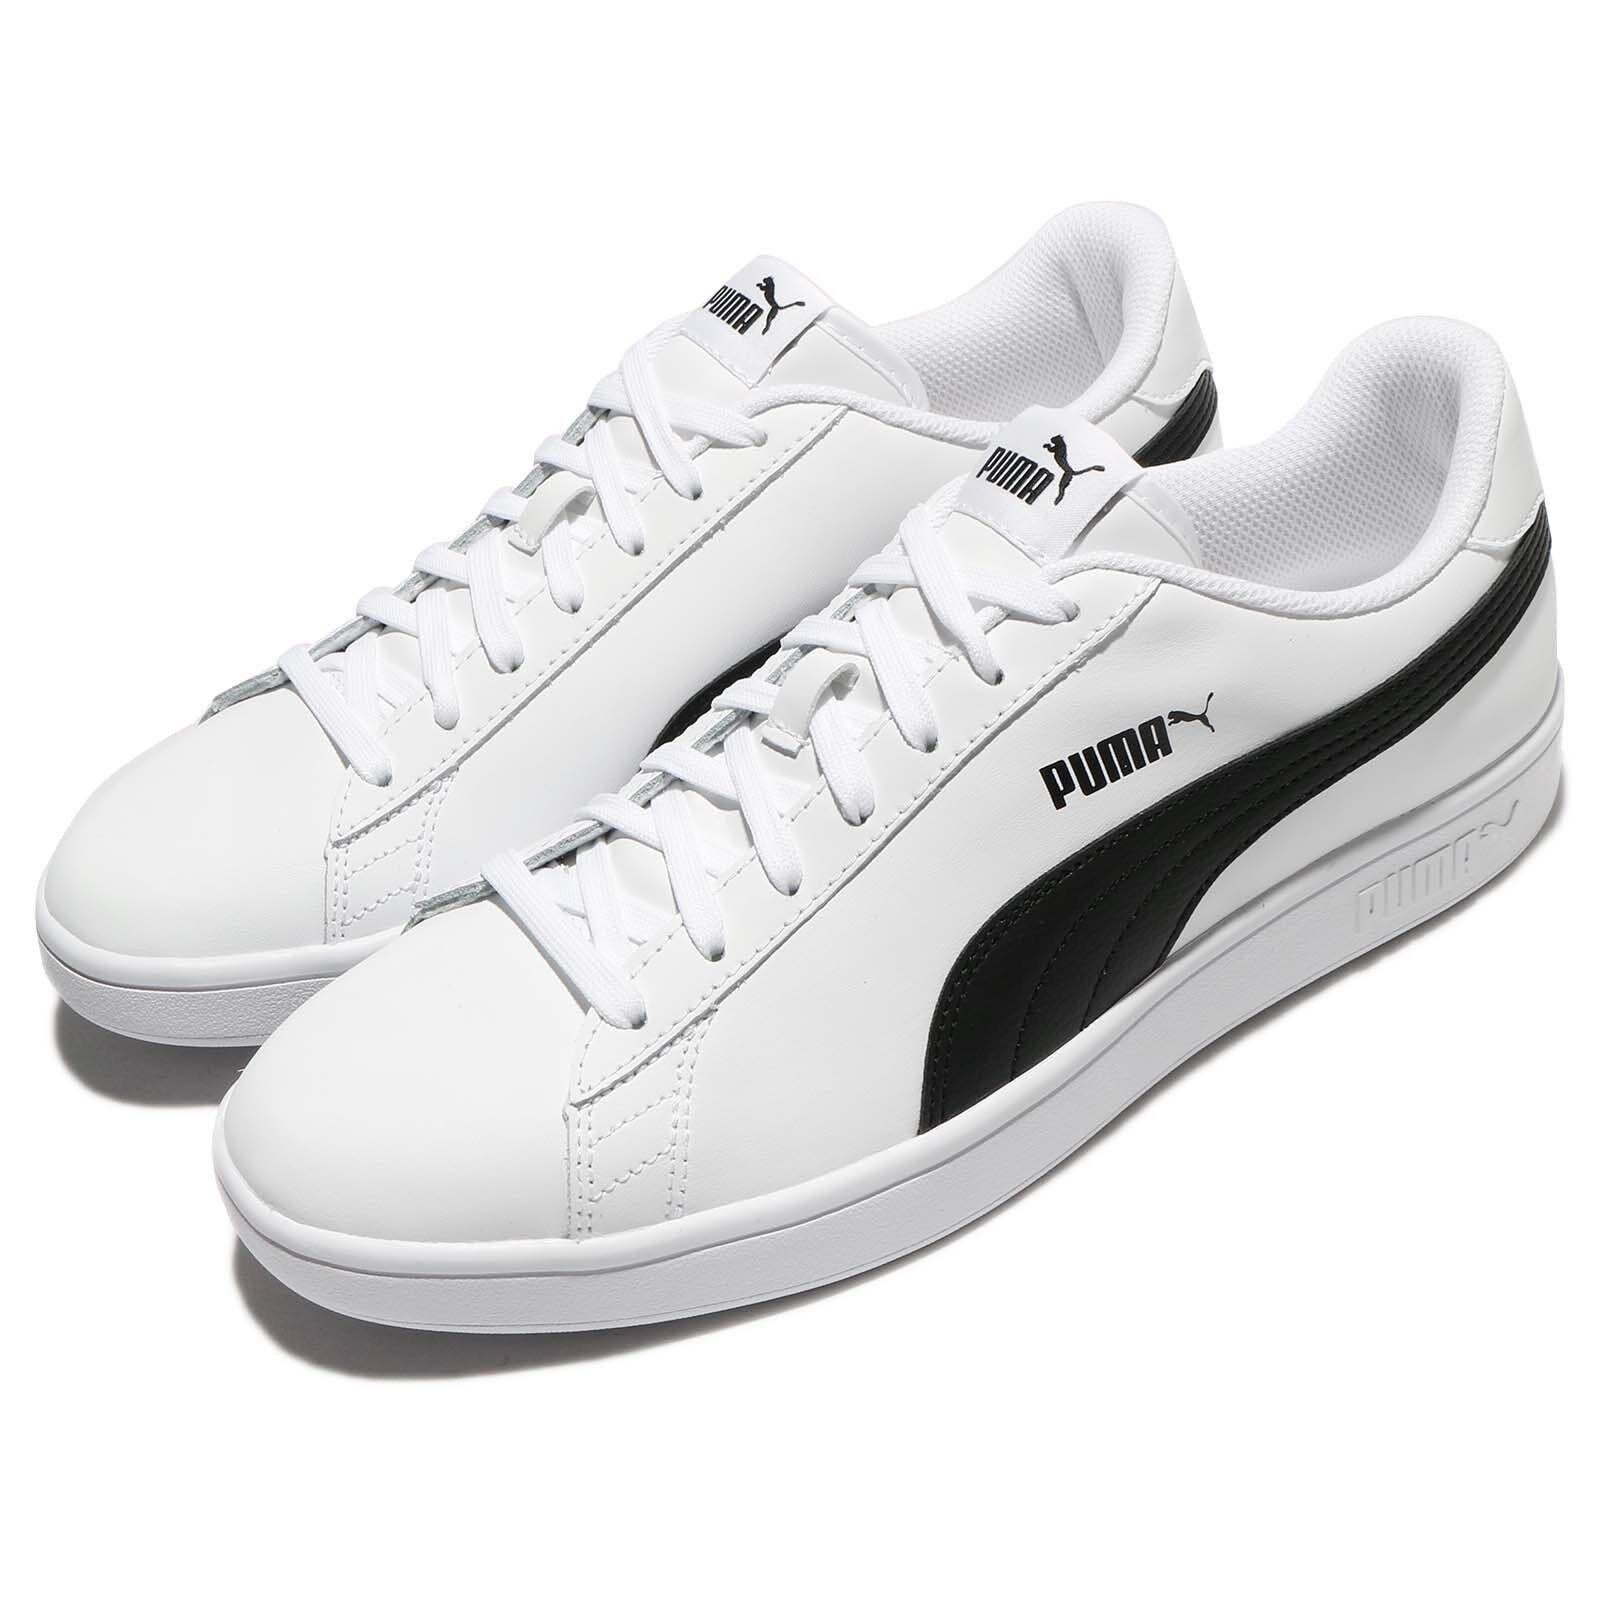 Puma Smash V2 L White Black Classic Men shoes Sneakers Trainers 365215-01